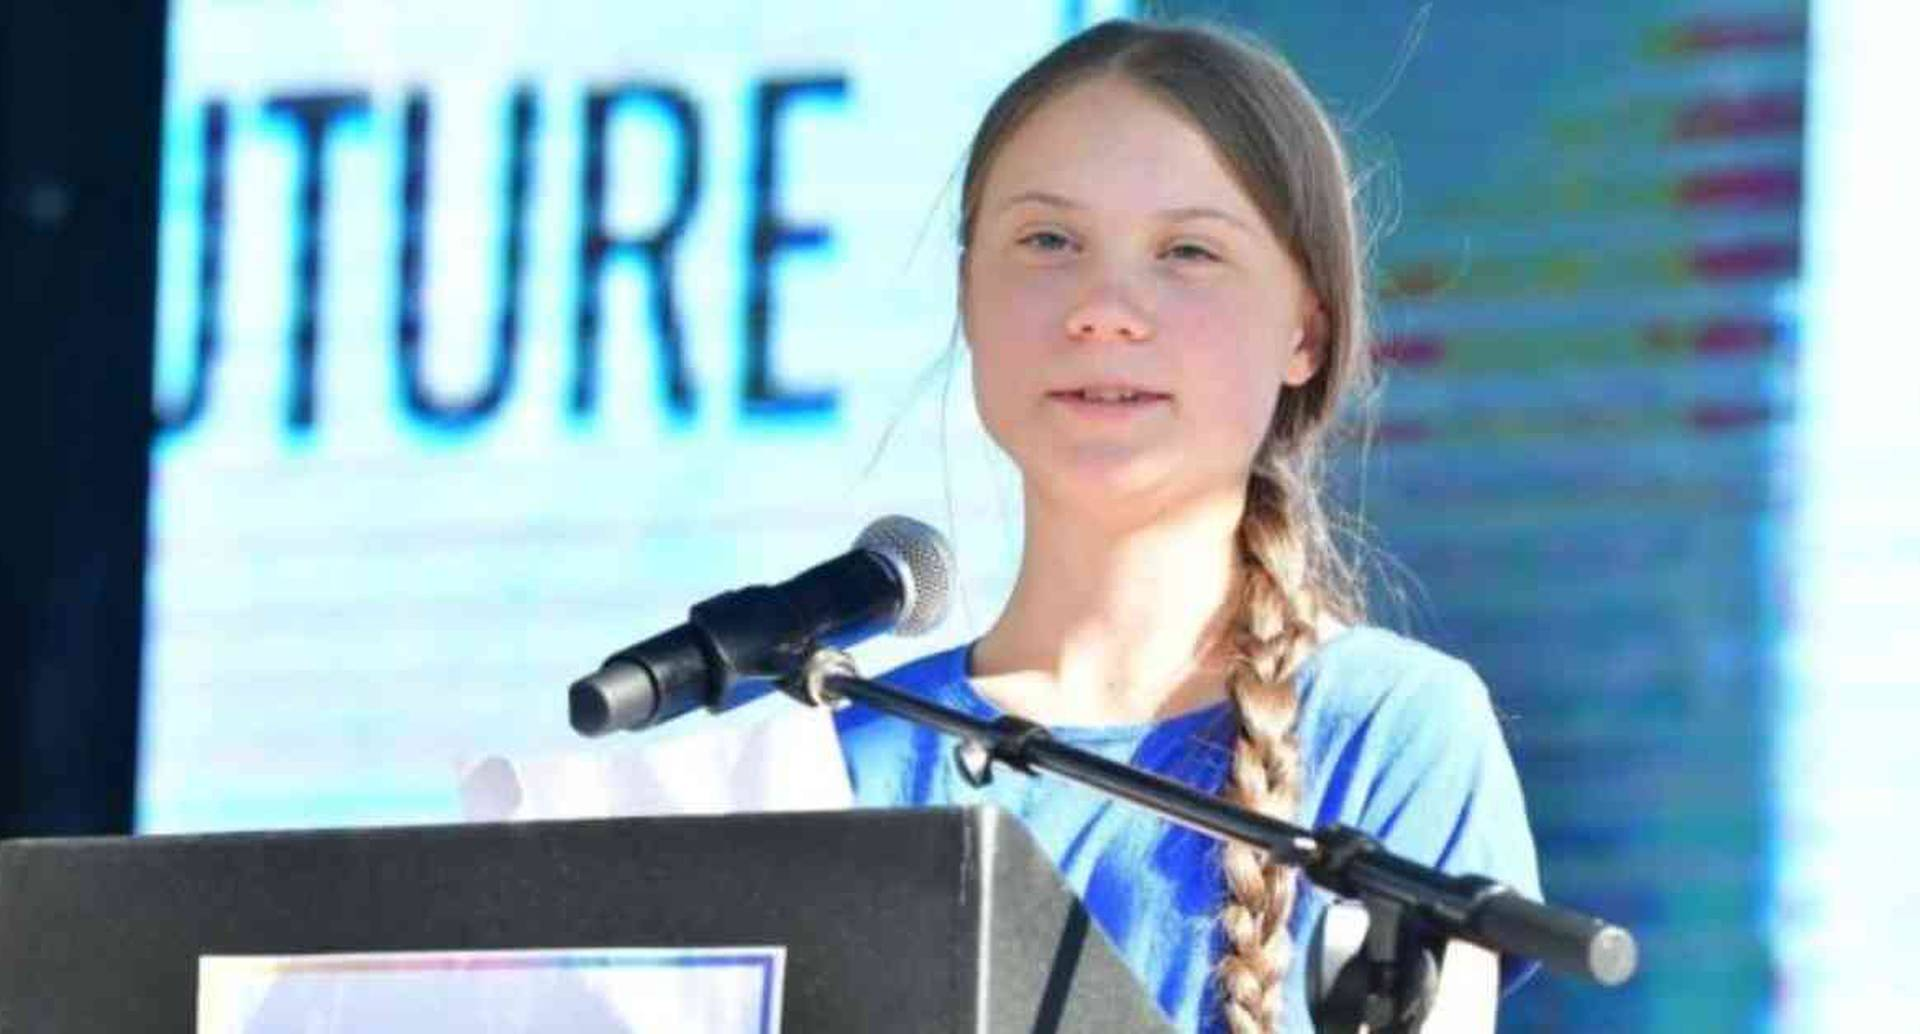 La vida de Greta Thunberg se mostrará a través de la pantalla grande. Foto: AFP